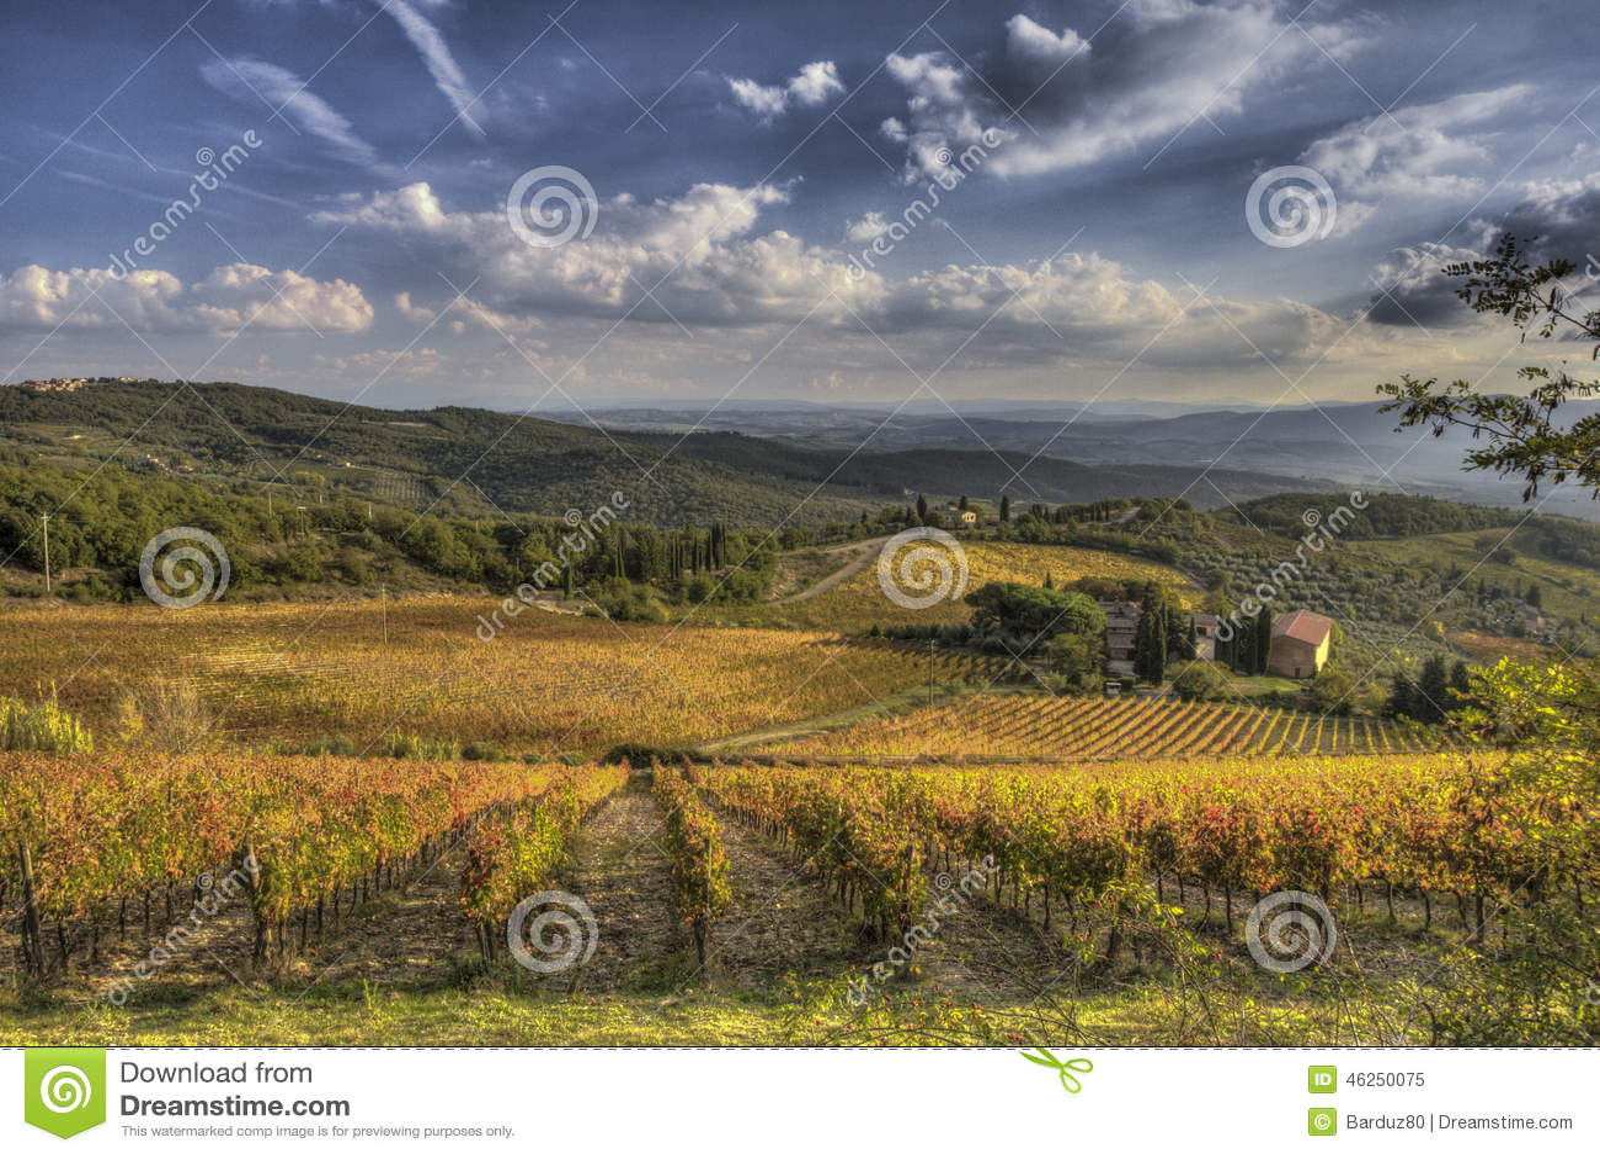 Vineyard of Chianti